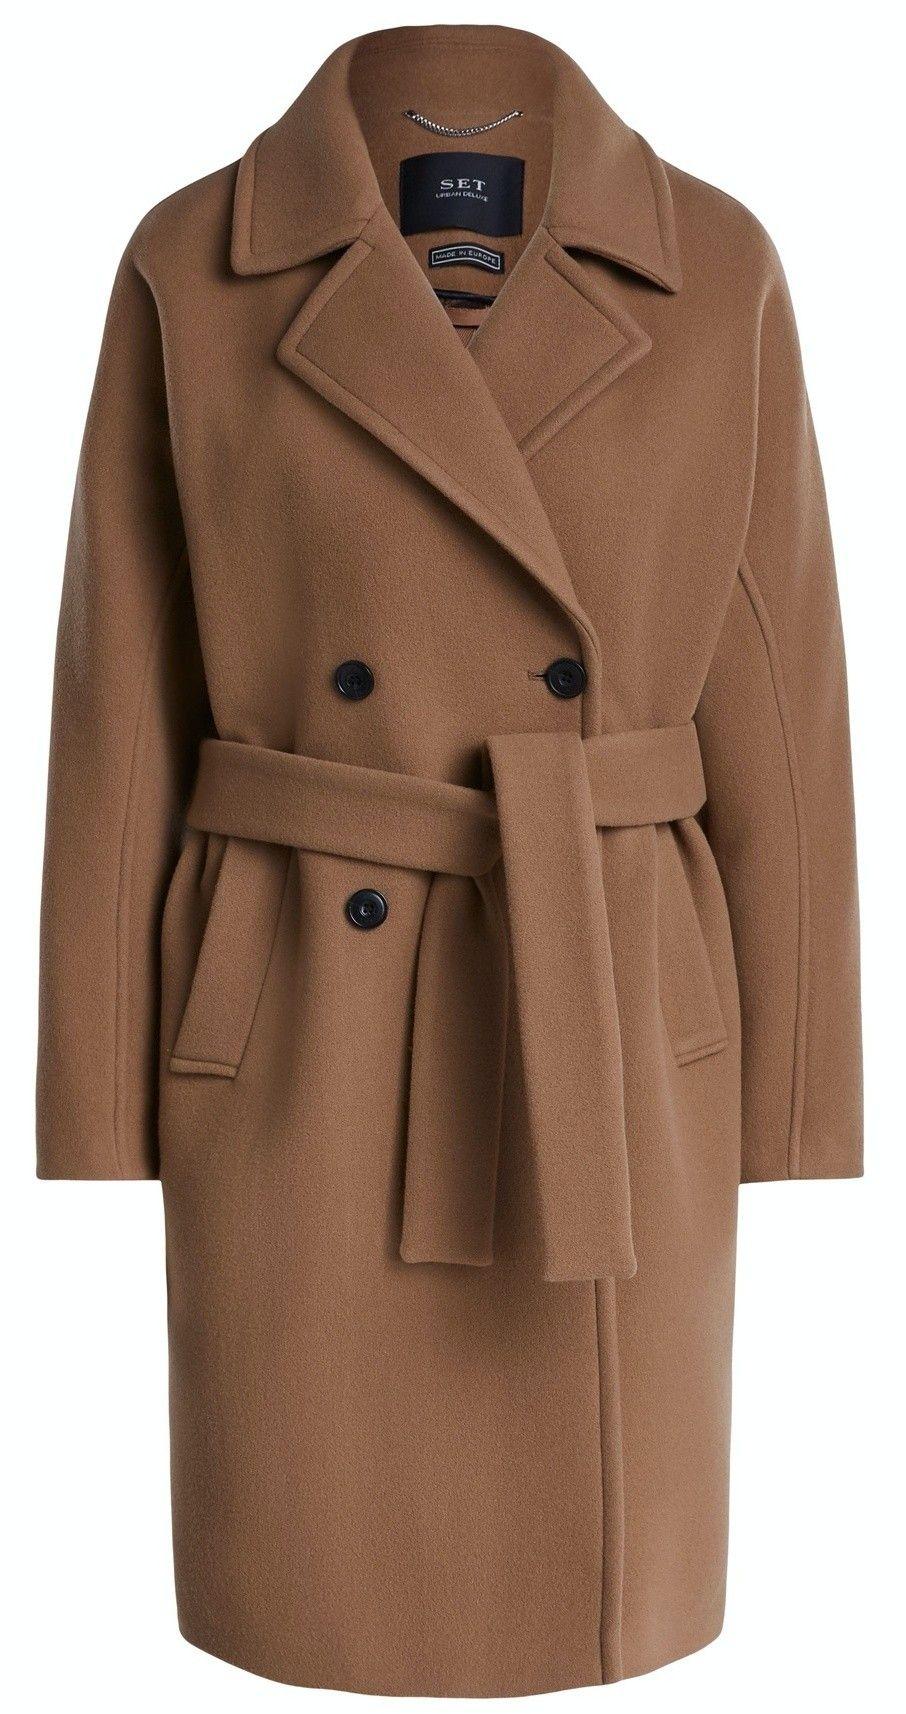 SET - Damen Mantel - Wollmantel mit Kimonoärmeln - Rehbraun